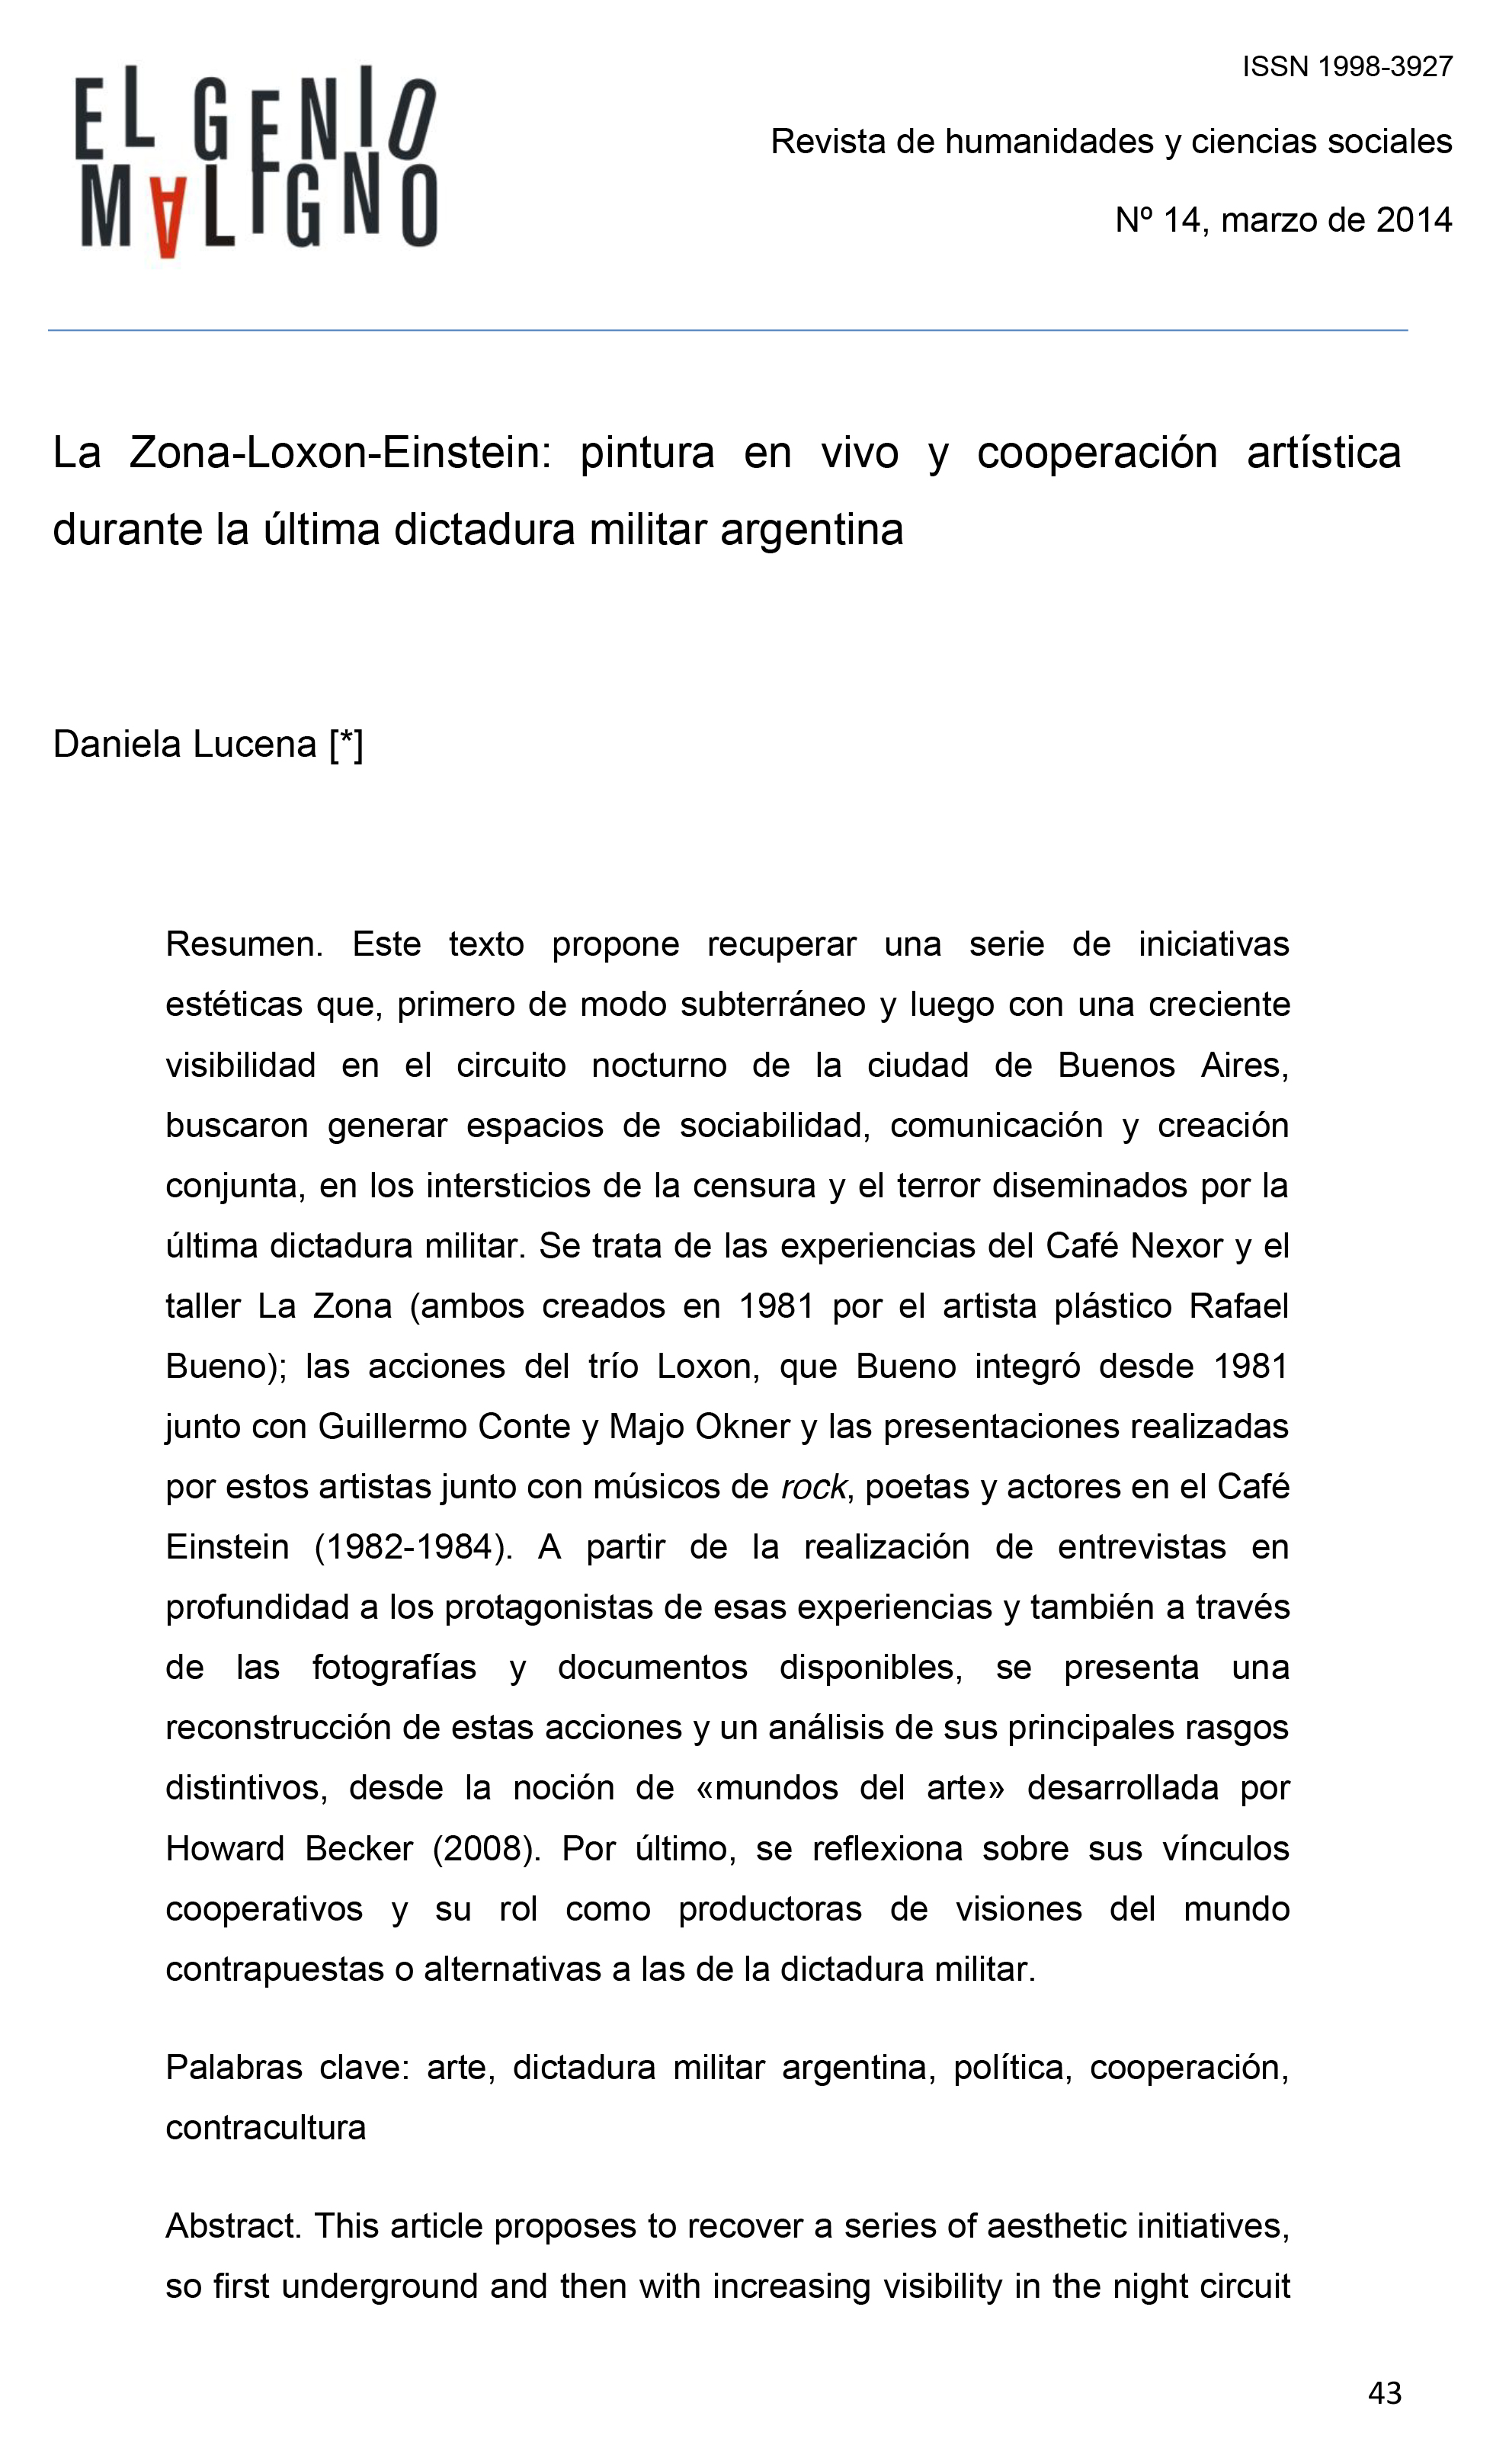 materia2_inhibición_lazonaloxoneinstein_dlucena-1.jpg